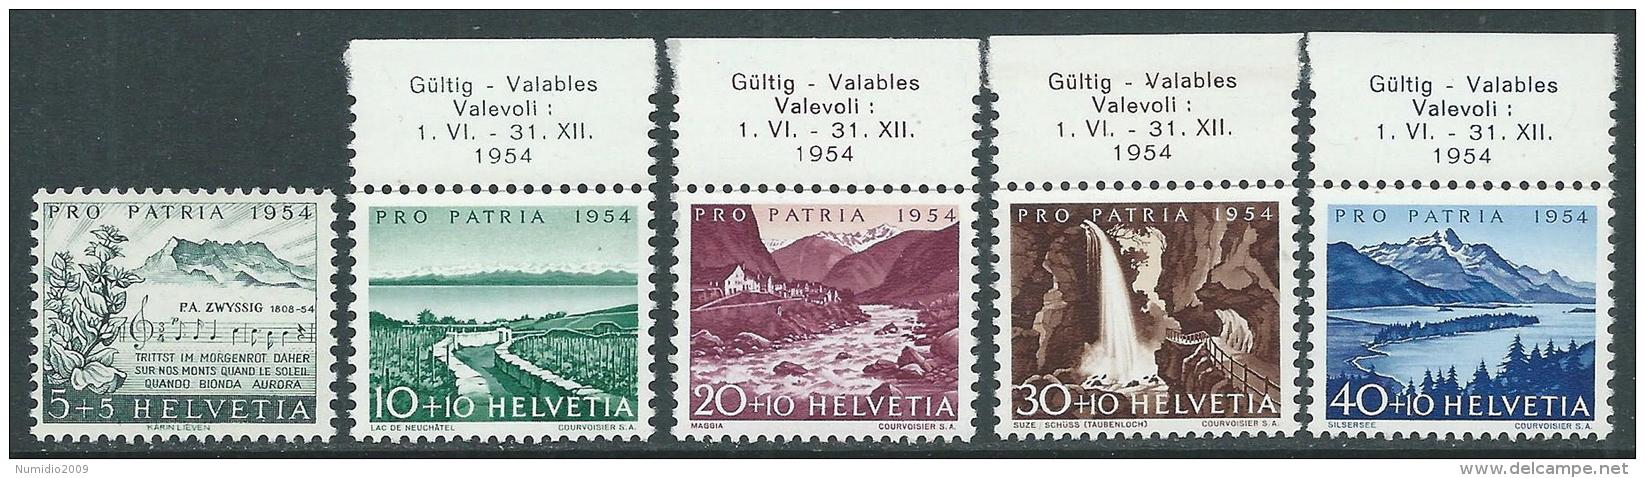 1954 SVIZZERA PRO PATRIA VEDUTE DIVERSE MNH ** - I58 - Nuovi